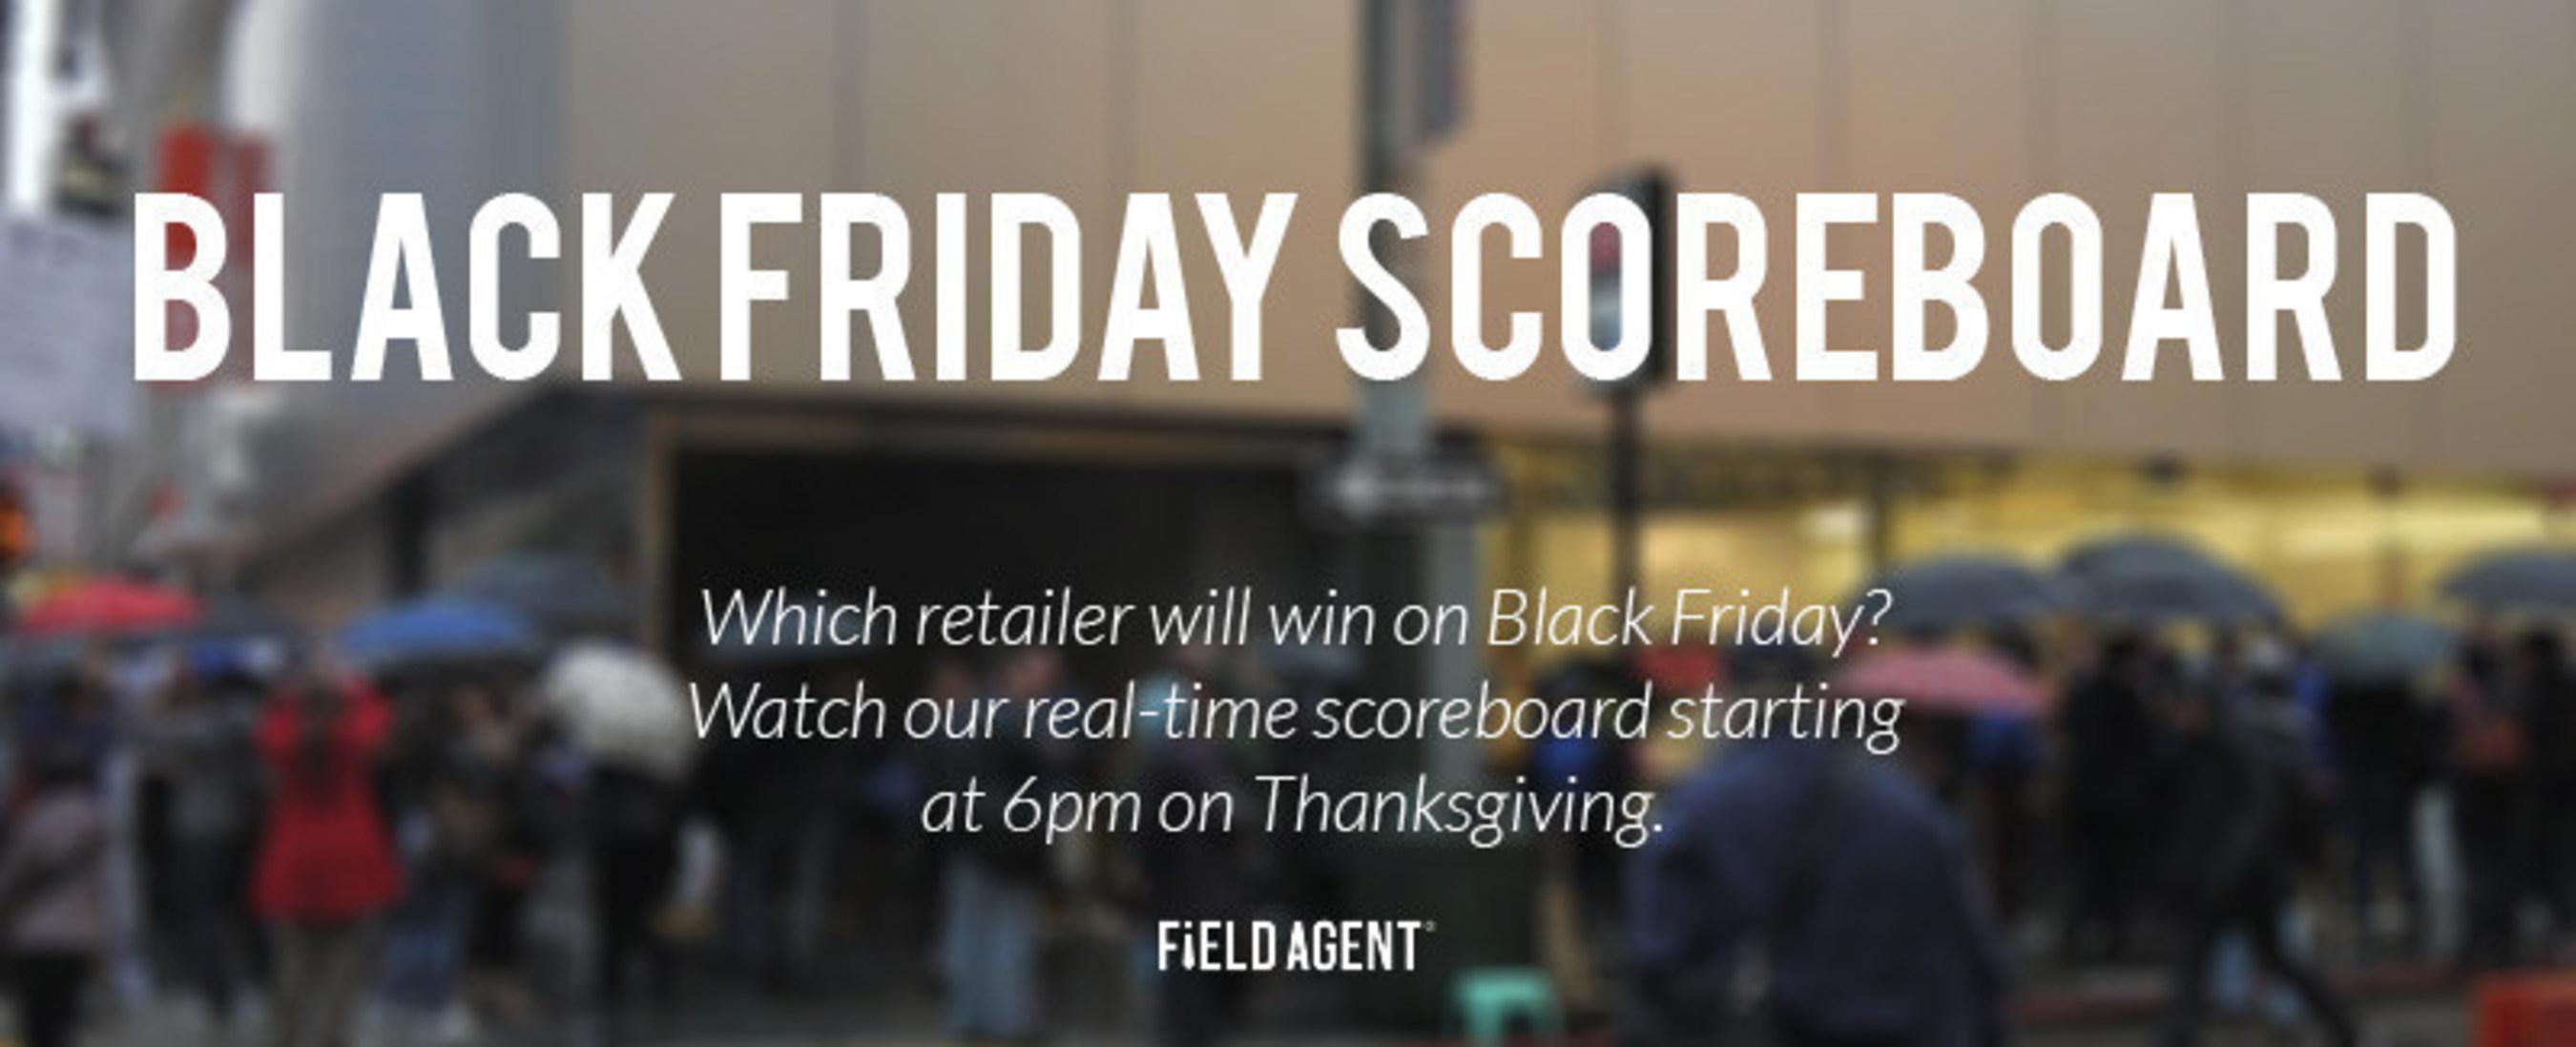 Where Is America Shopping On Black Friday? The Black Friday Scoreboard Tells Us